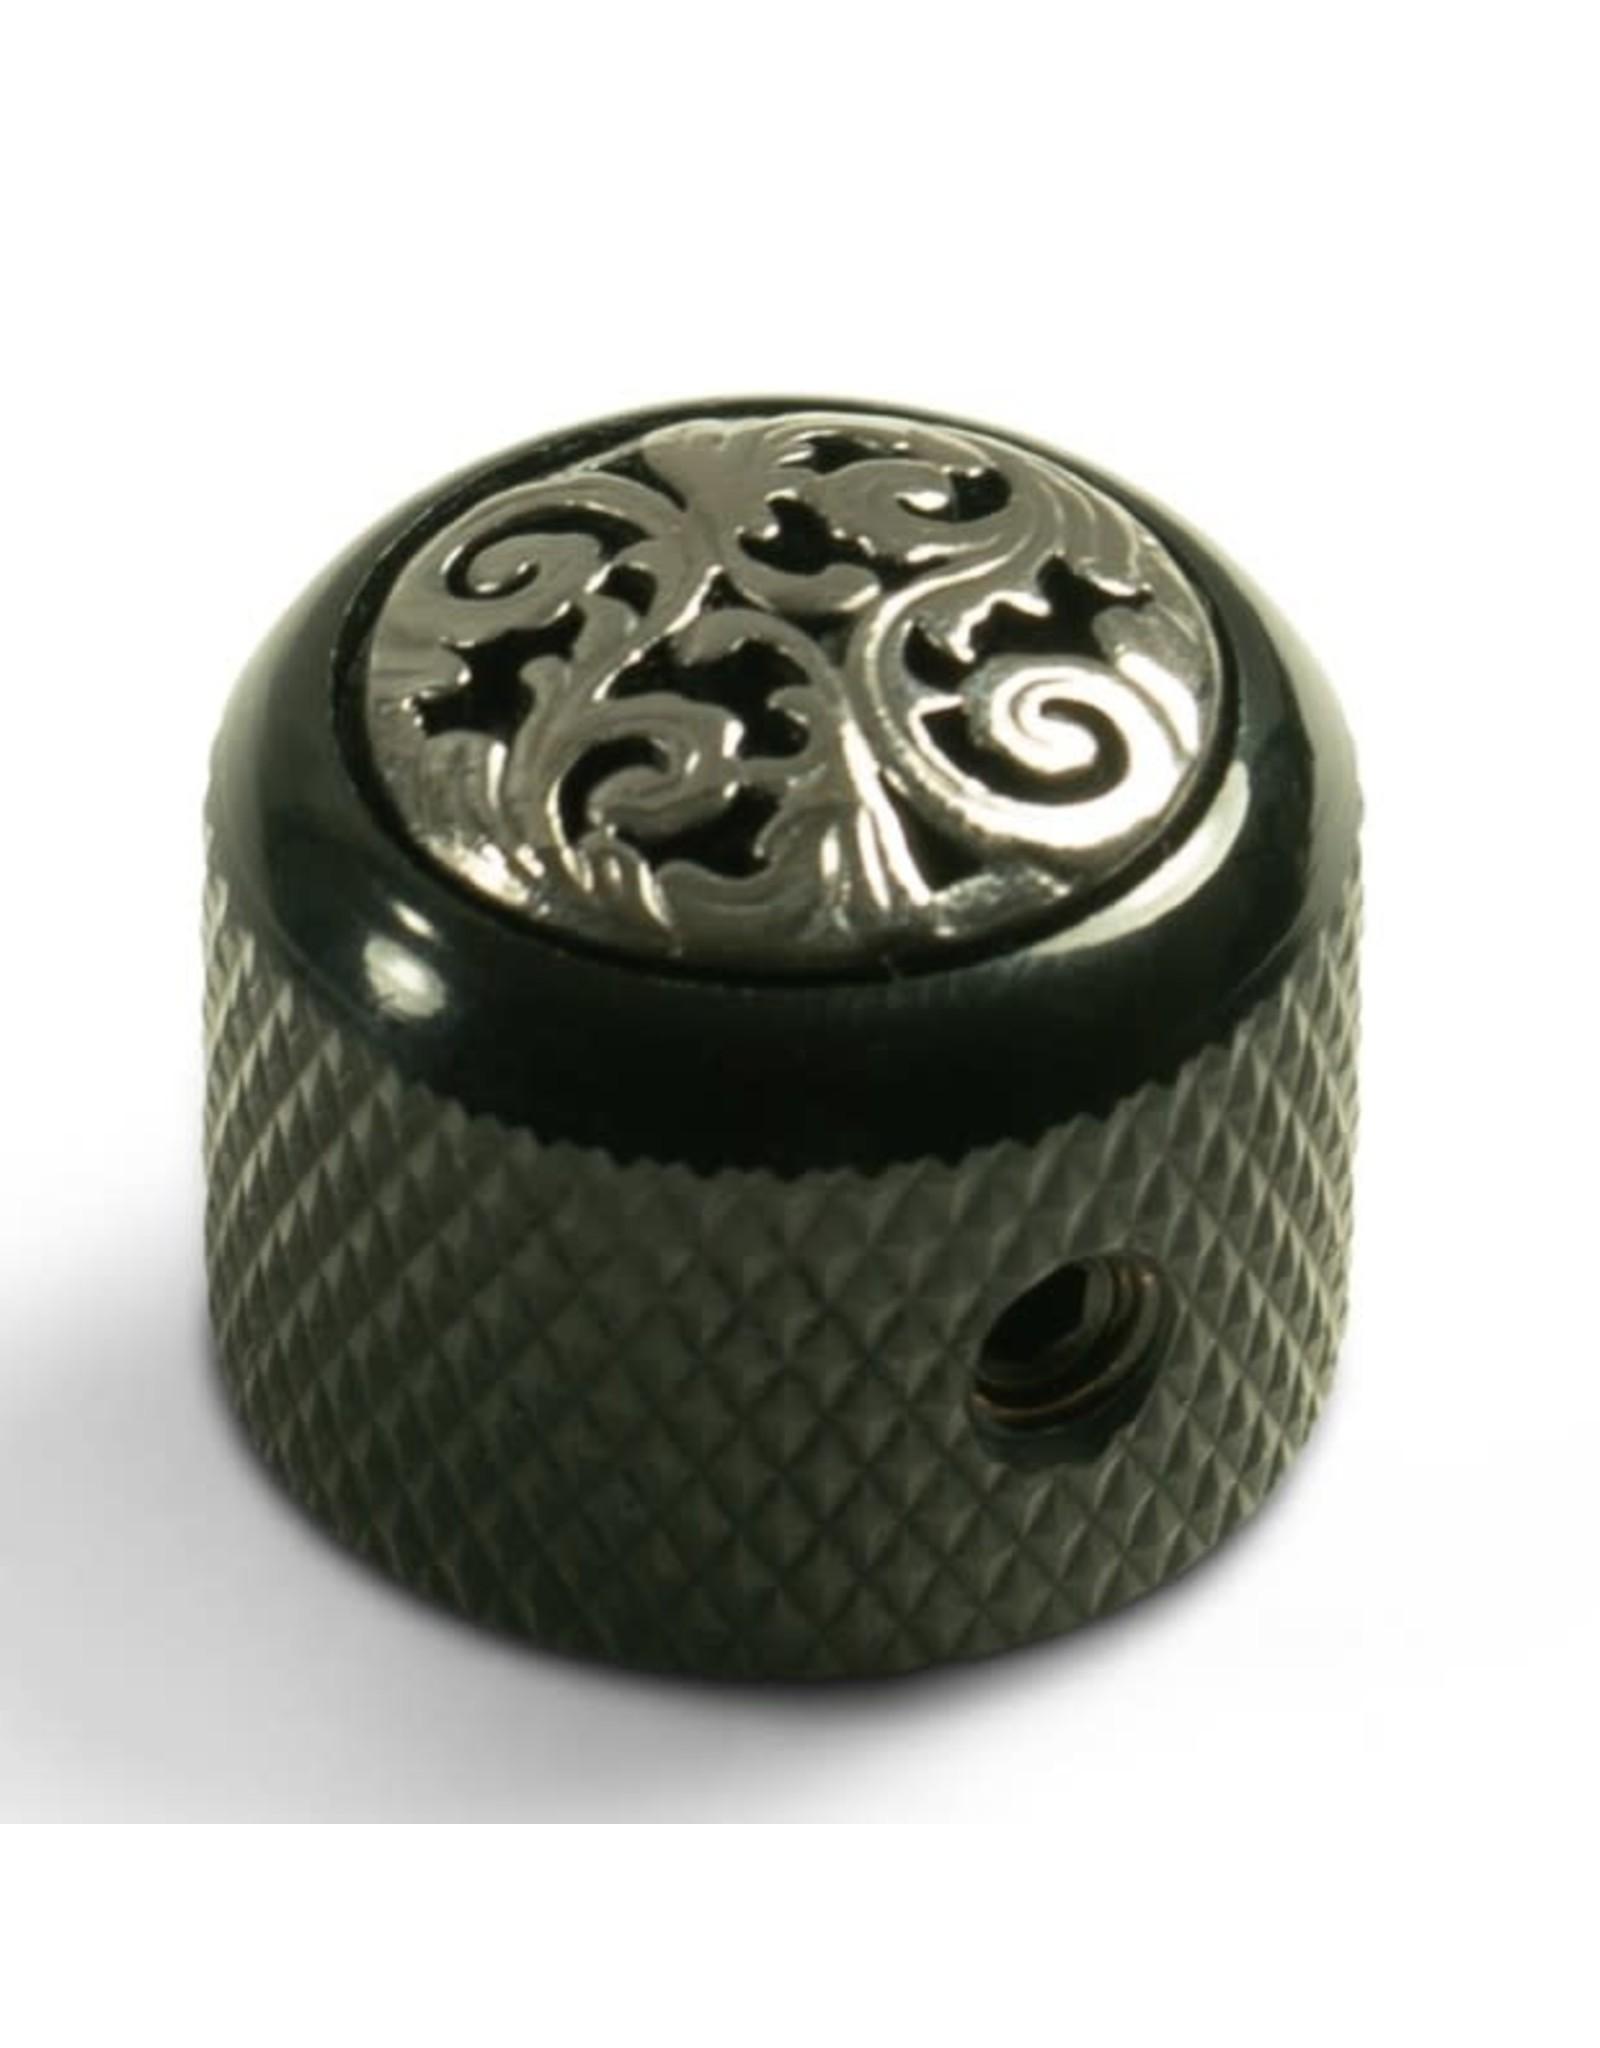 Q-Parts Q-Parts Knob With Vine Inlay Black